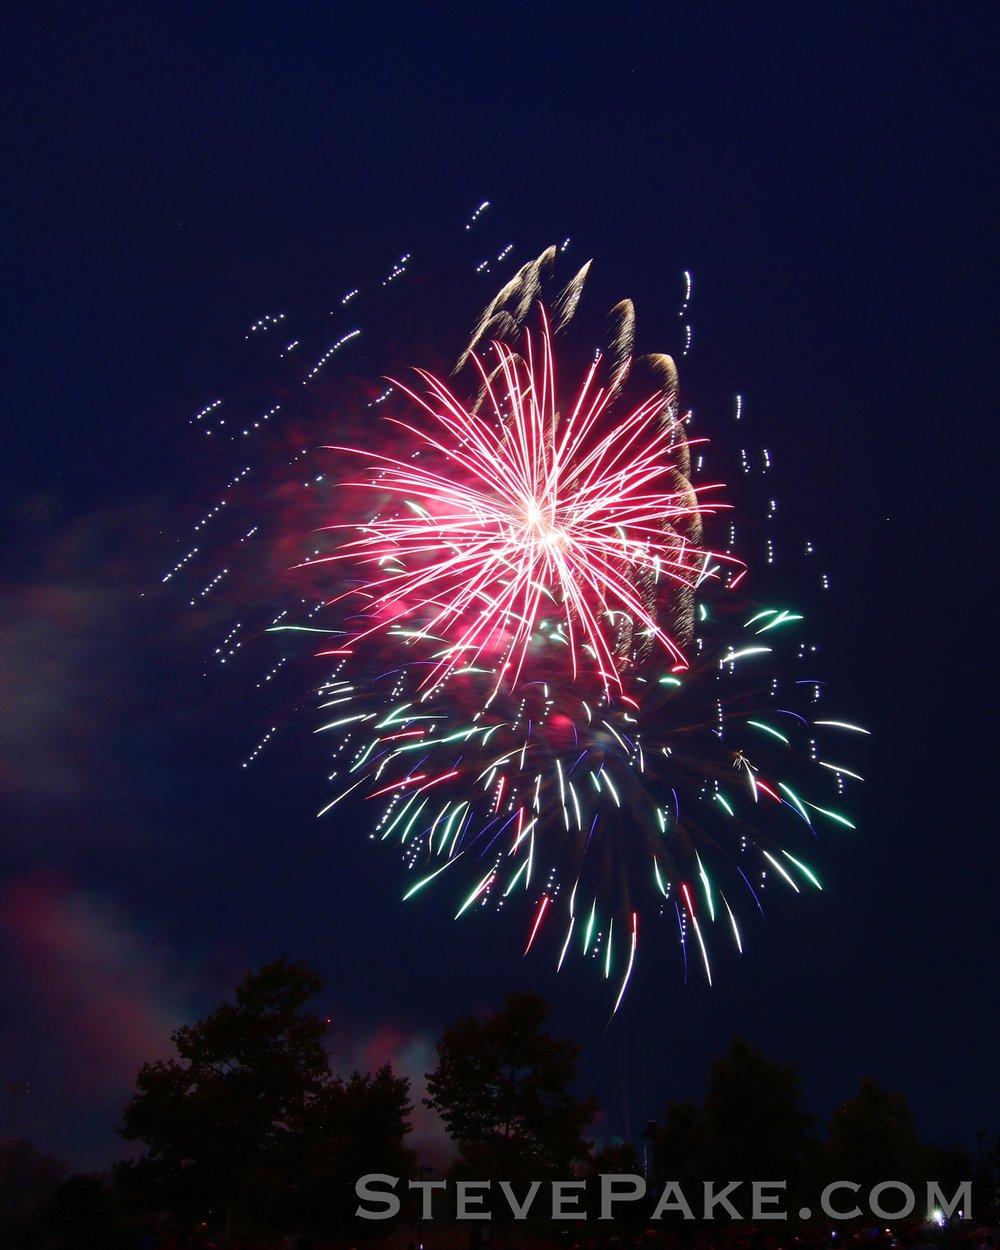 Fireworks2018_30_GE3A8556ap-HD-WM.jpg